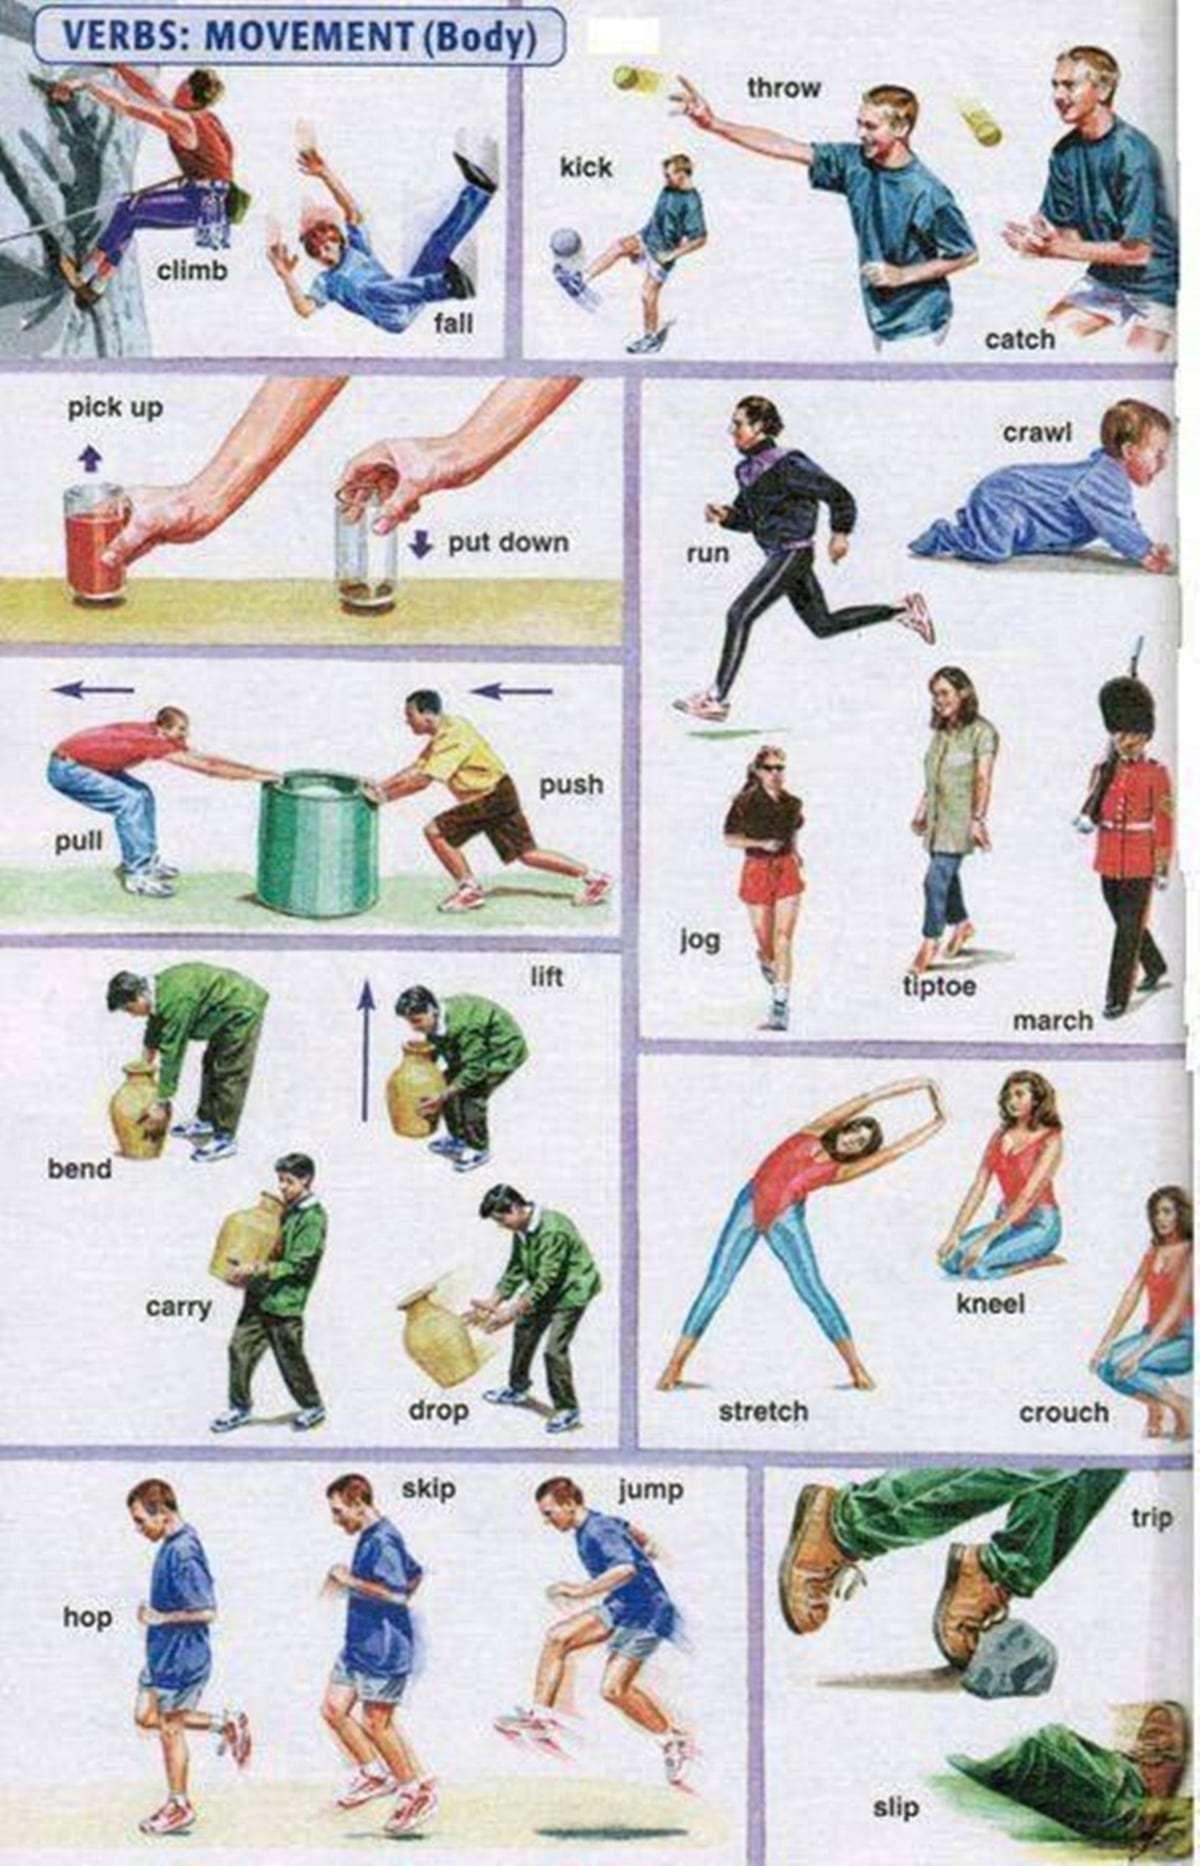 English Verbs Of Body Movement